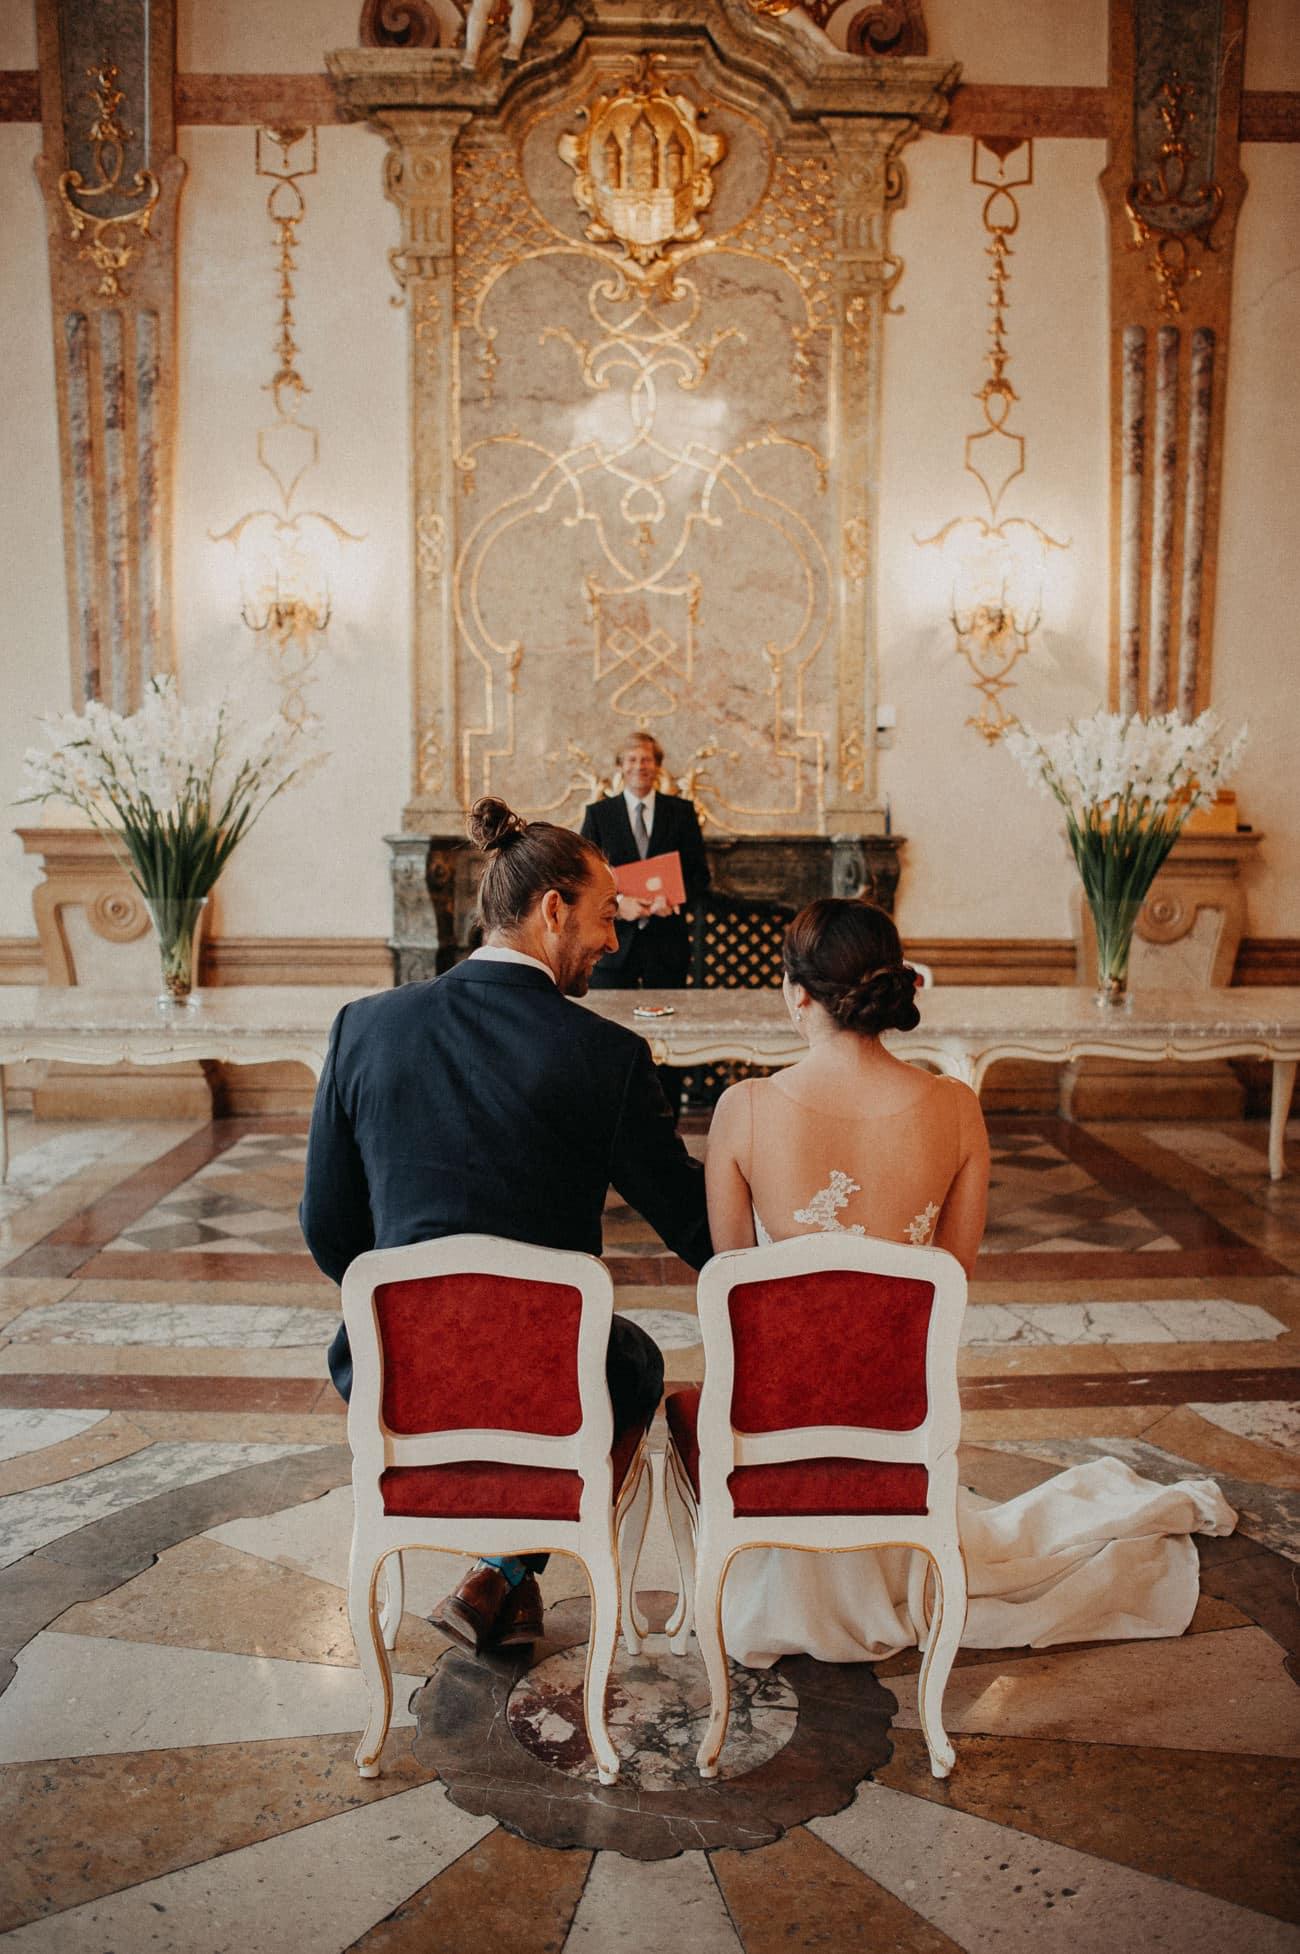 wedding photographer salzburg palace mirabell 046 - Mirabel Palace Wedding Photographer Salzburg